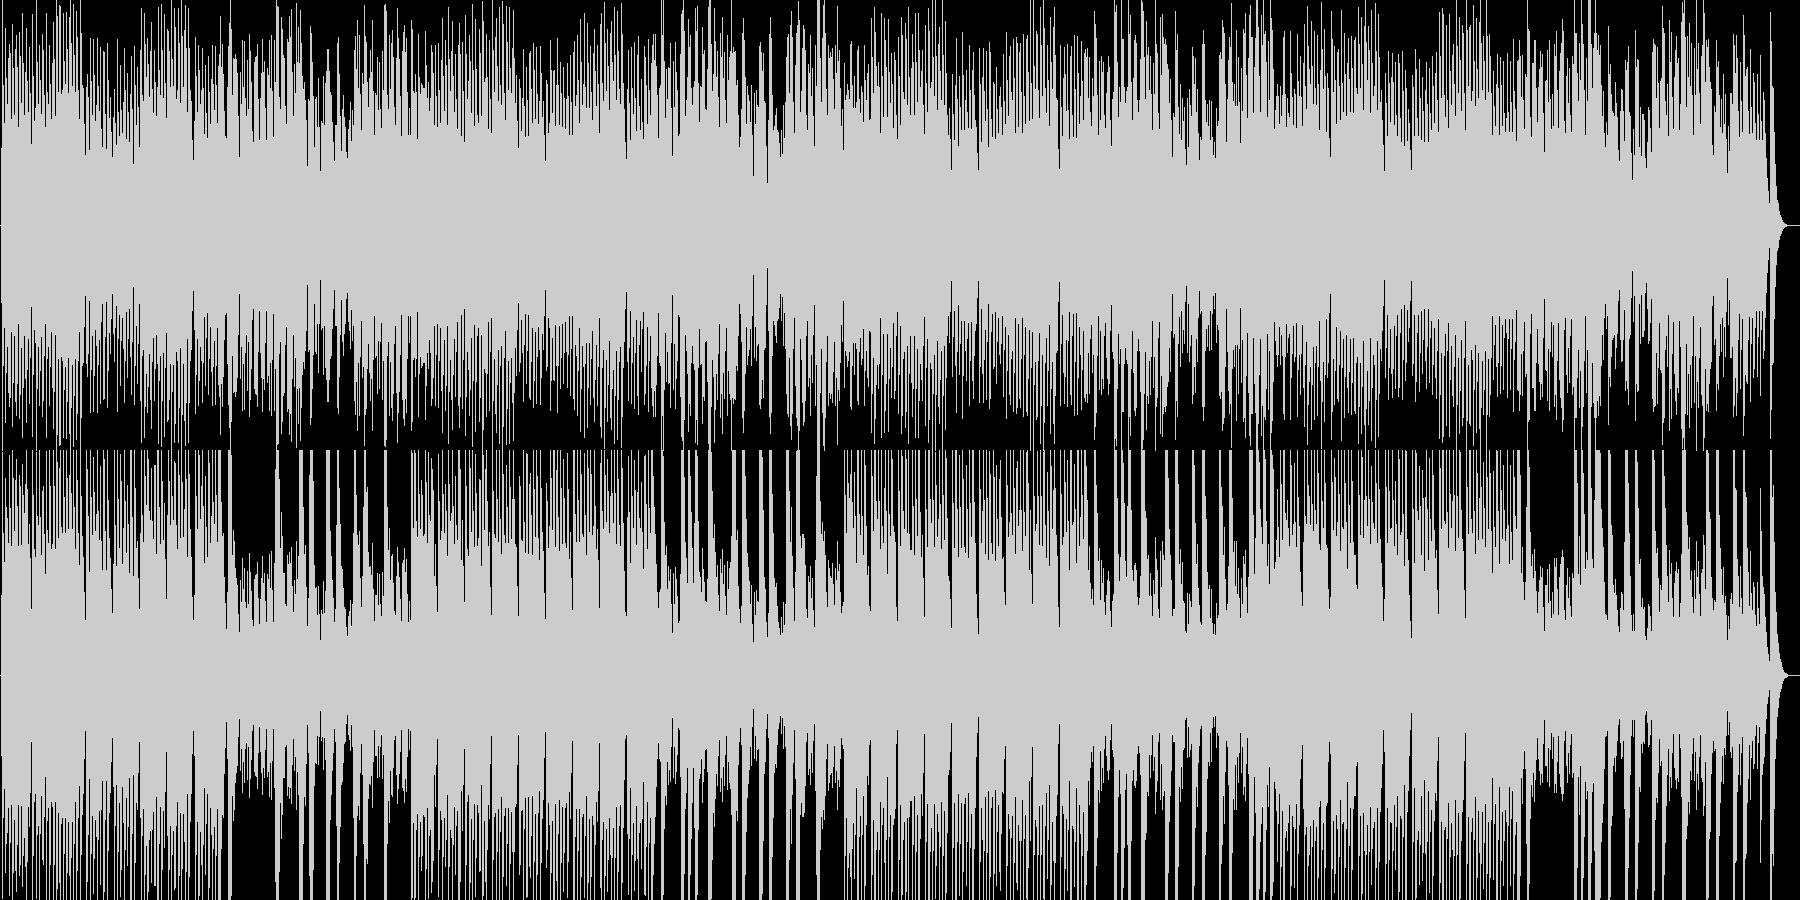 Retro nint sounds, racing puzzle game's unreproduced waveform